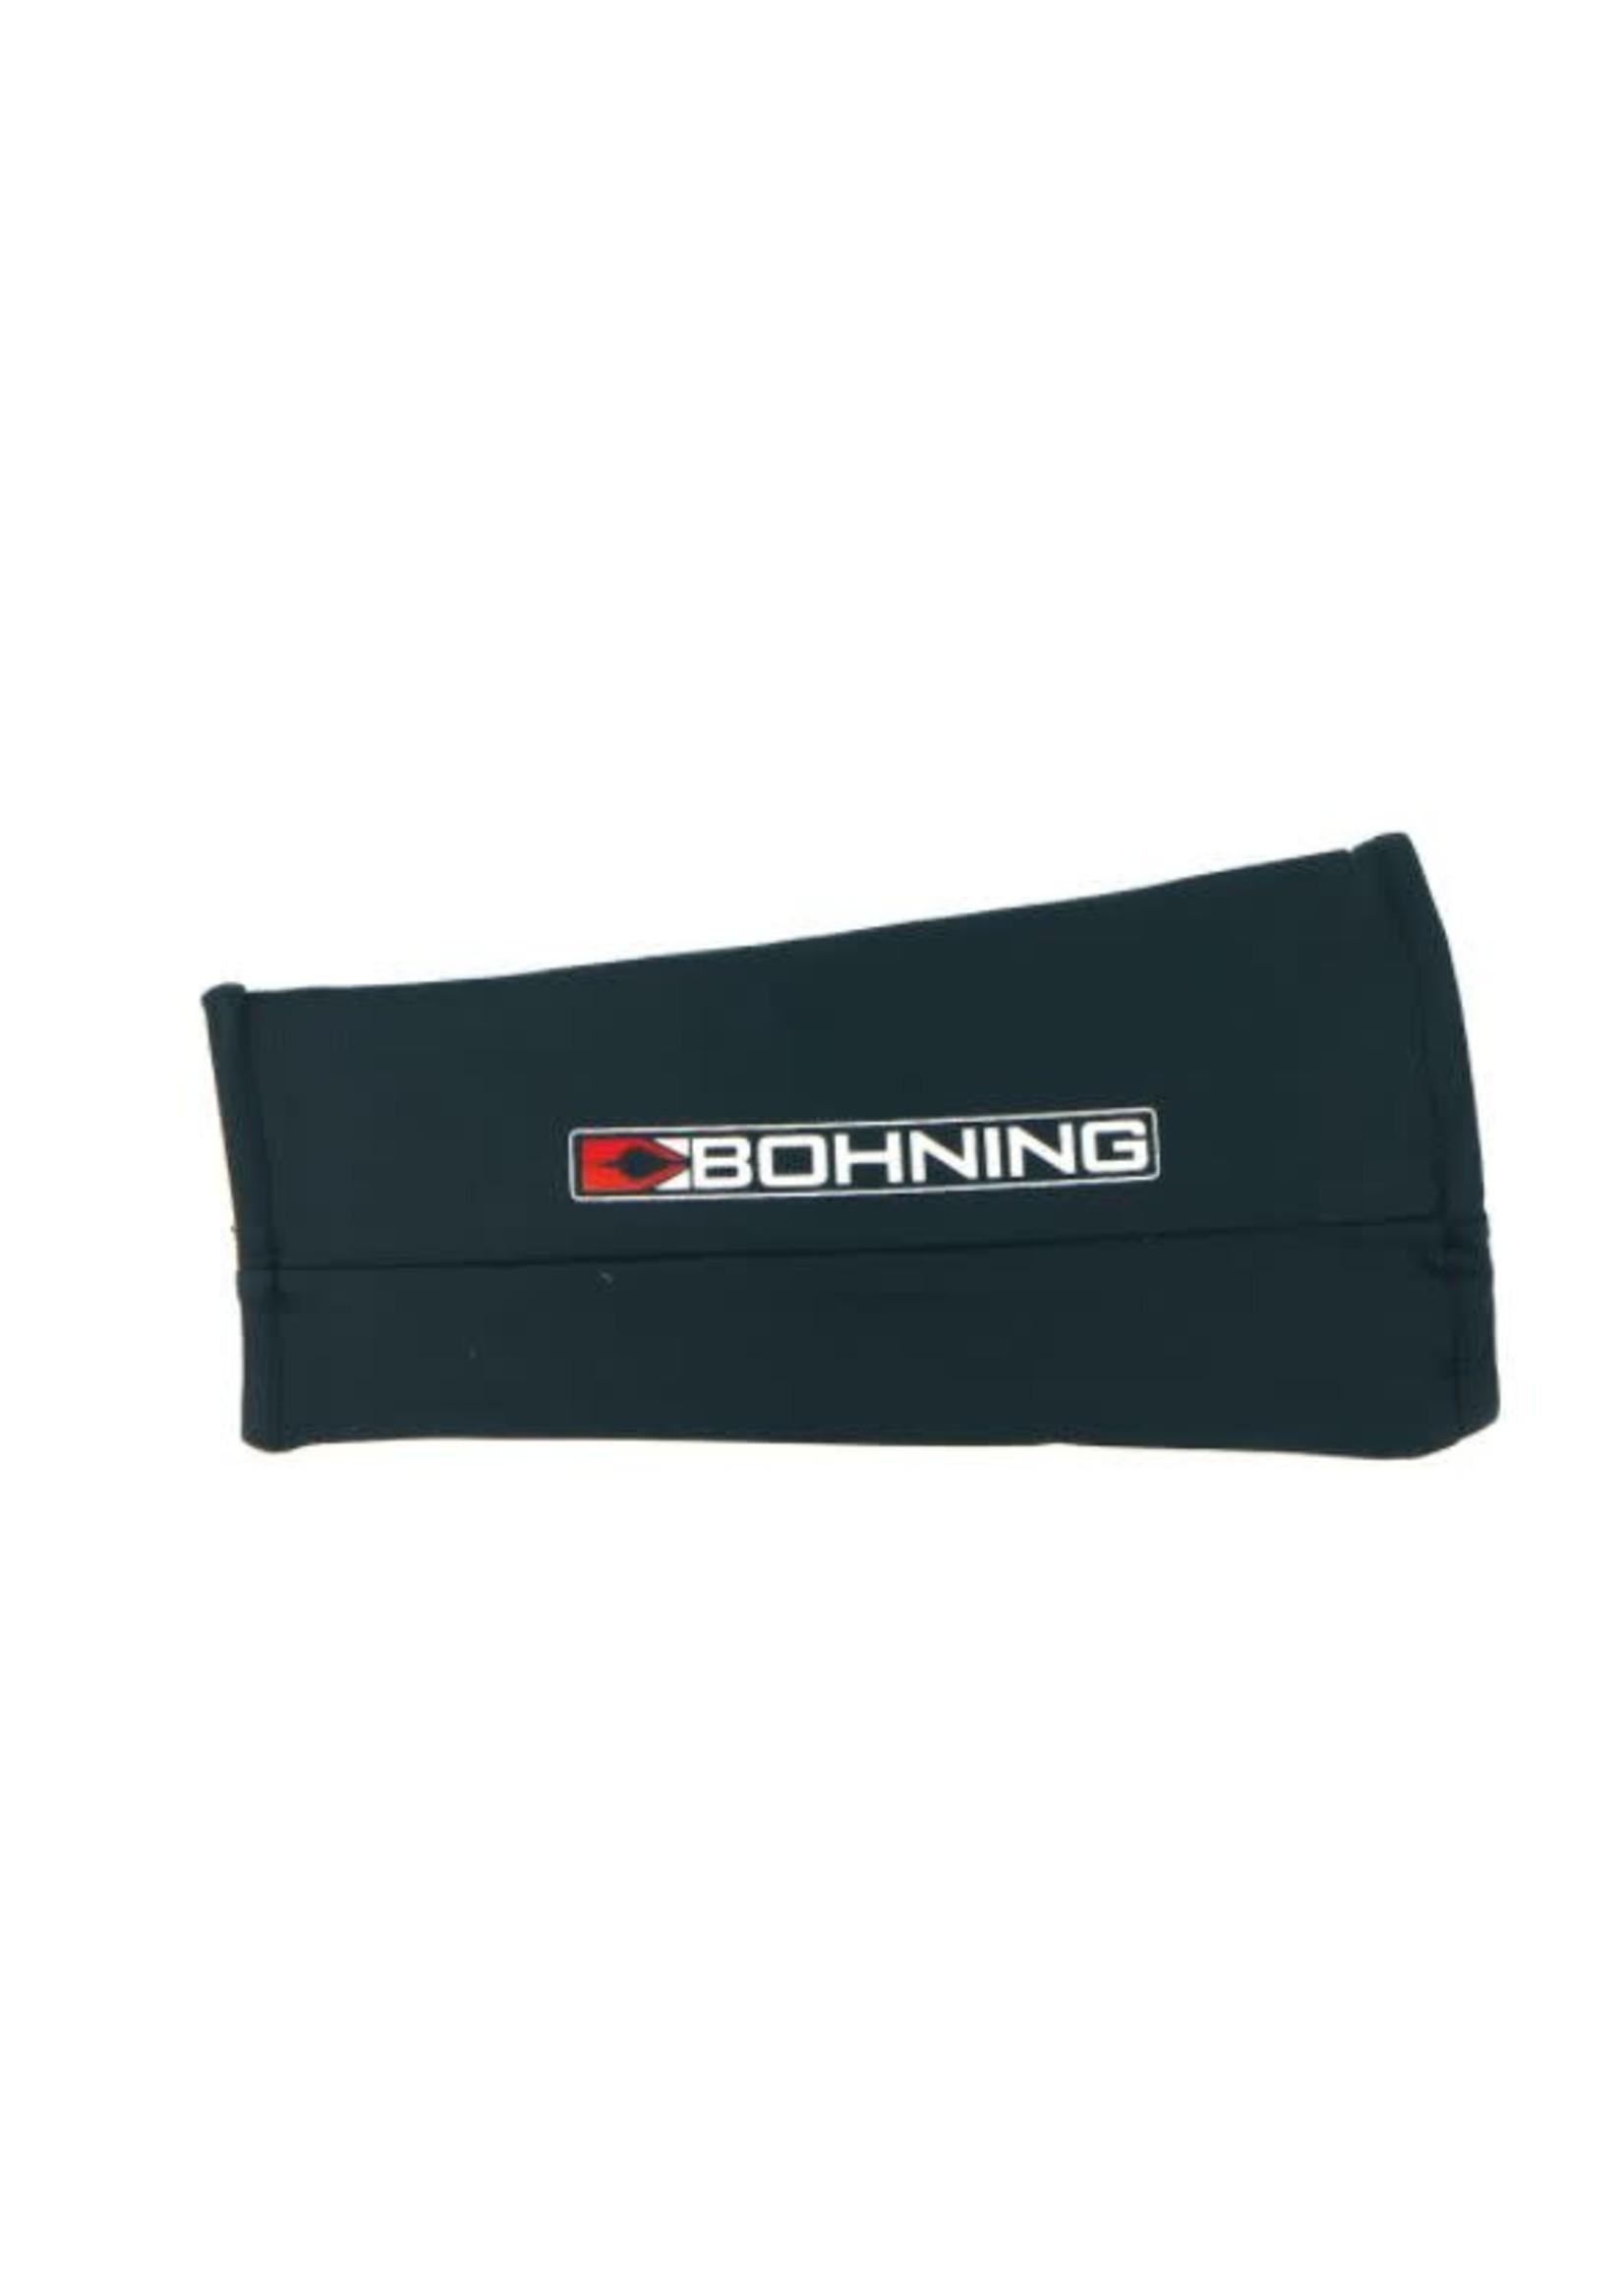 Bohning Slip-On Arm Guard Black Small